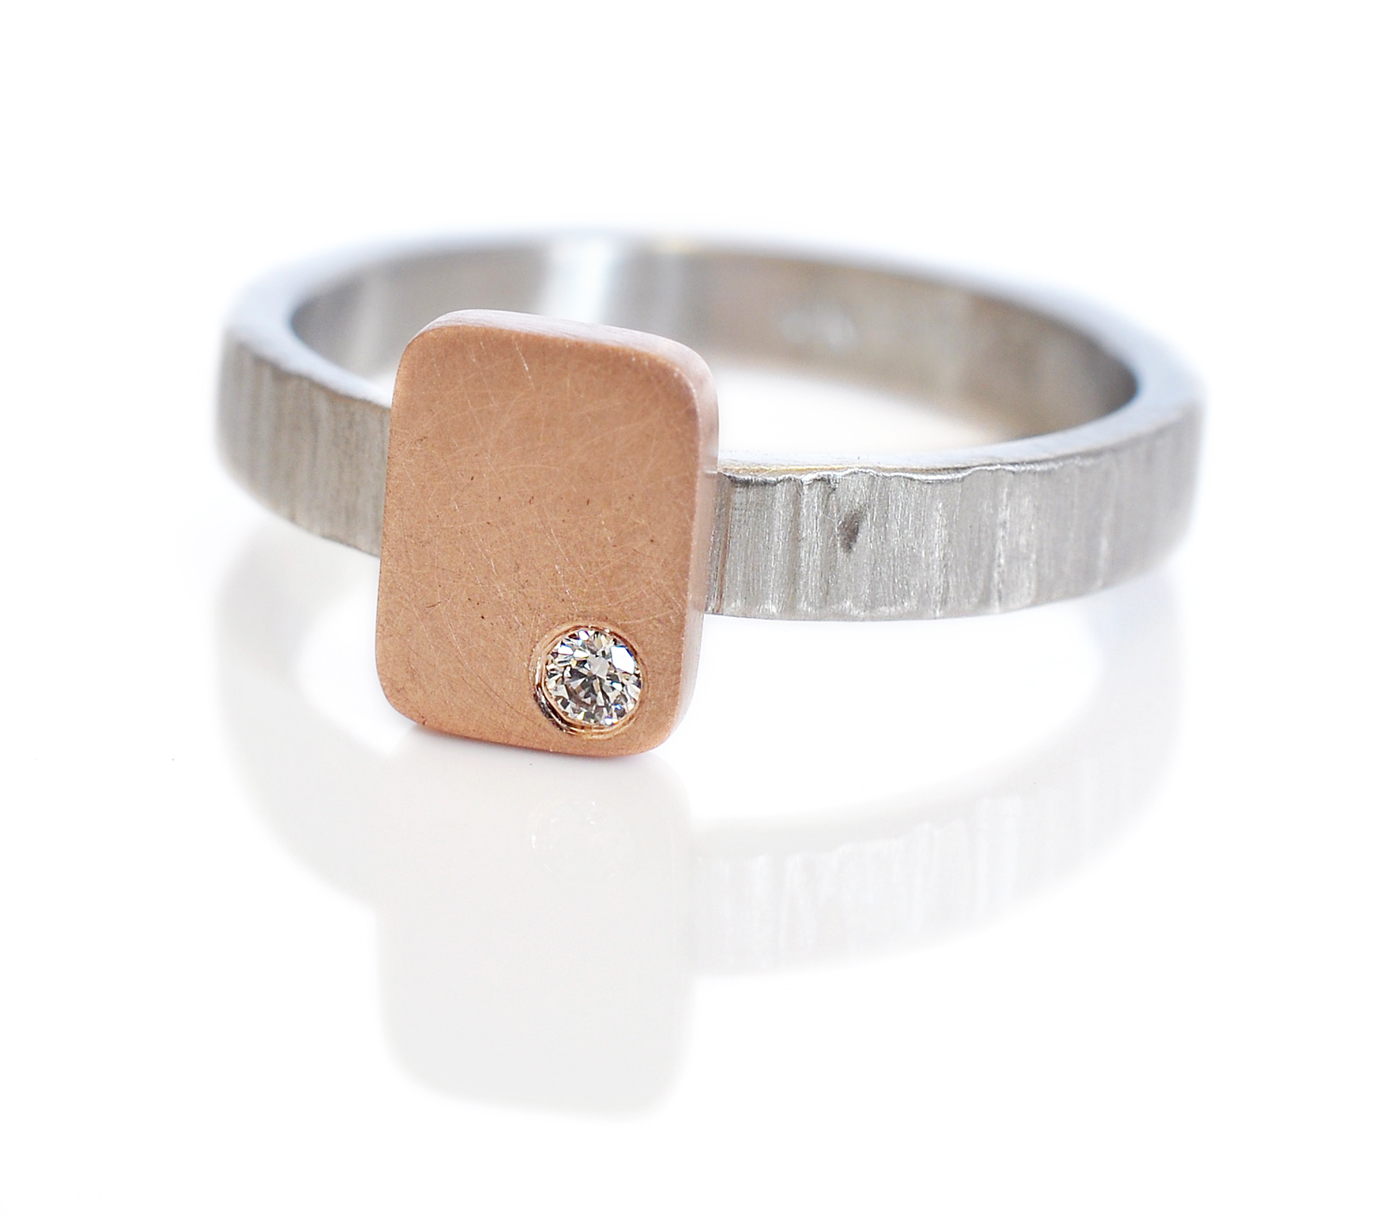 amber-kevin-custom-wedding-rings-14krosegold-950palladium-flushsetdiamonds